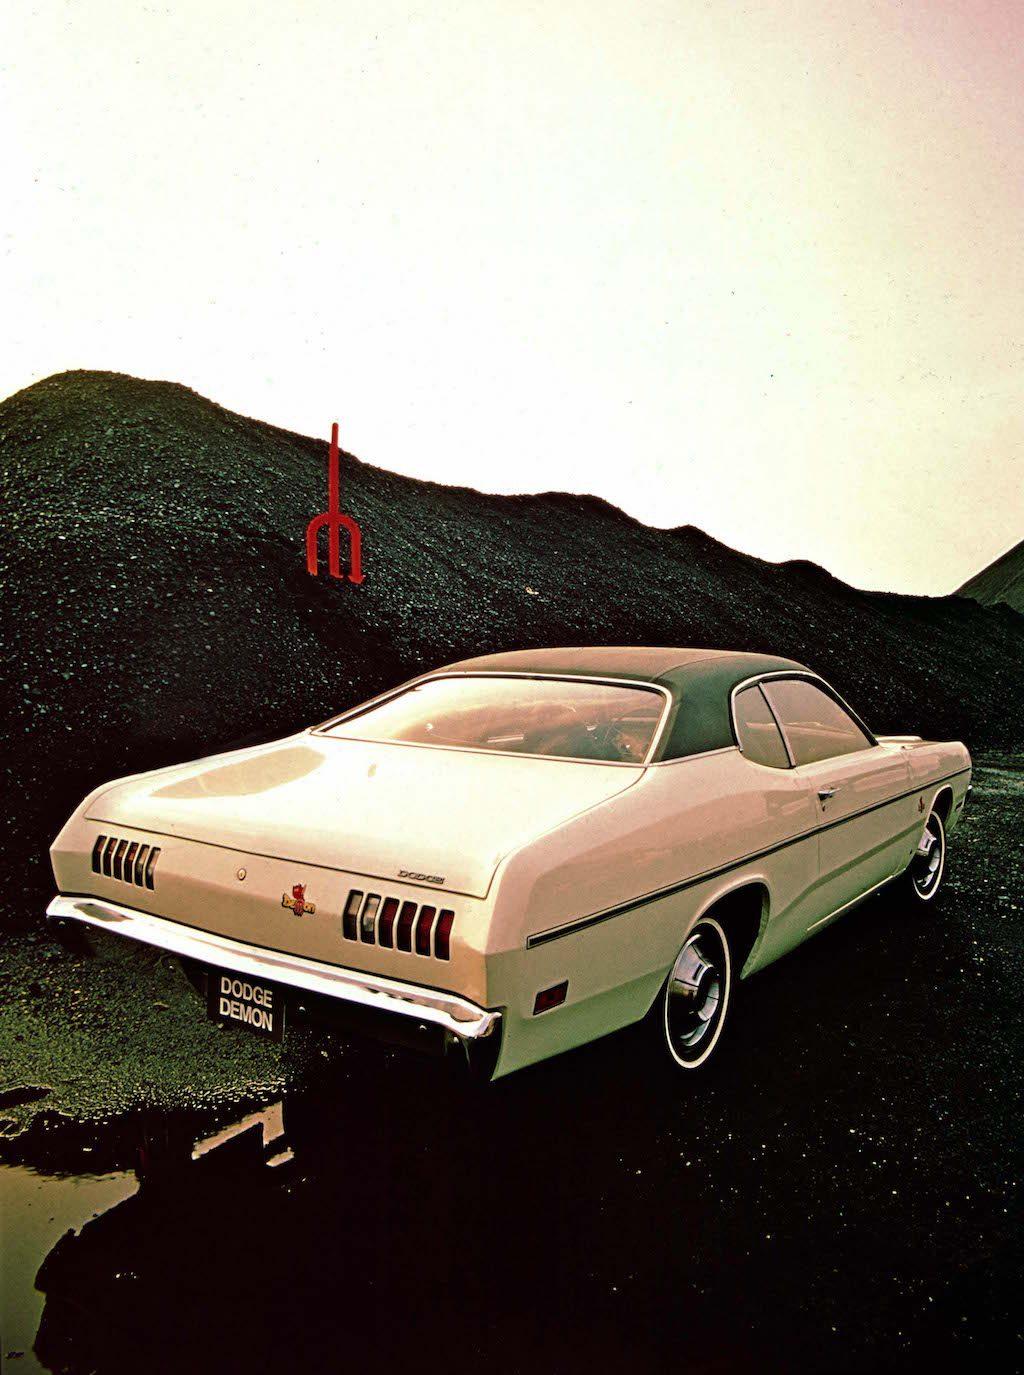 The 1971 Dodge Demon